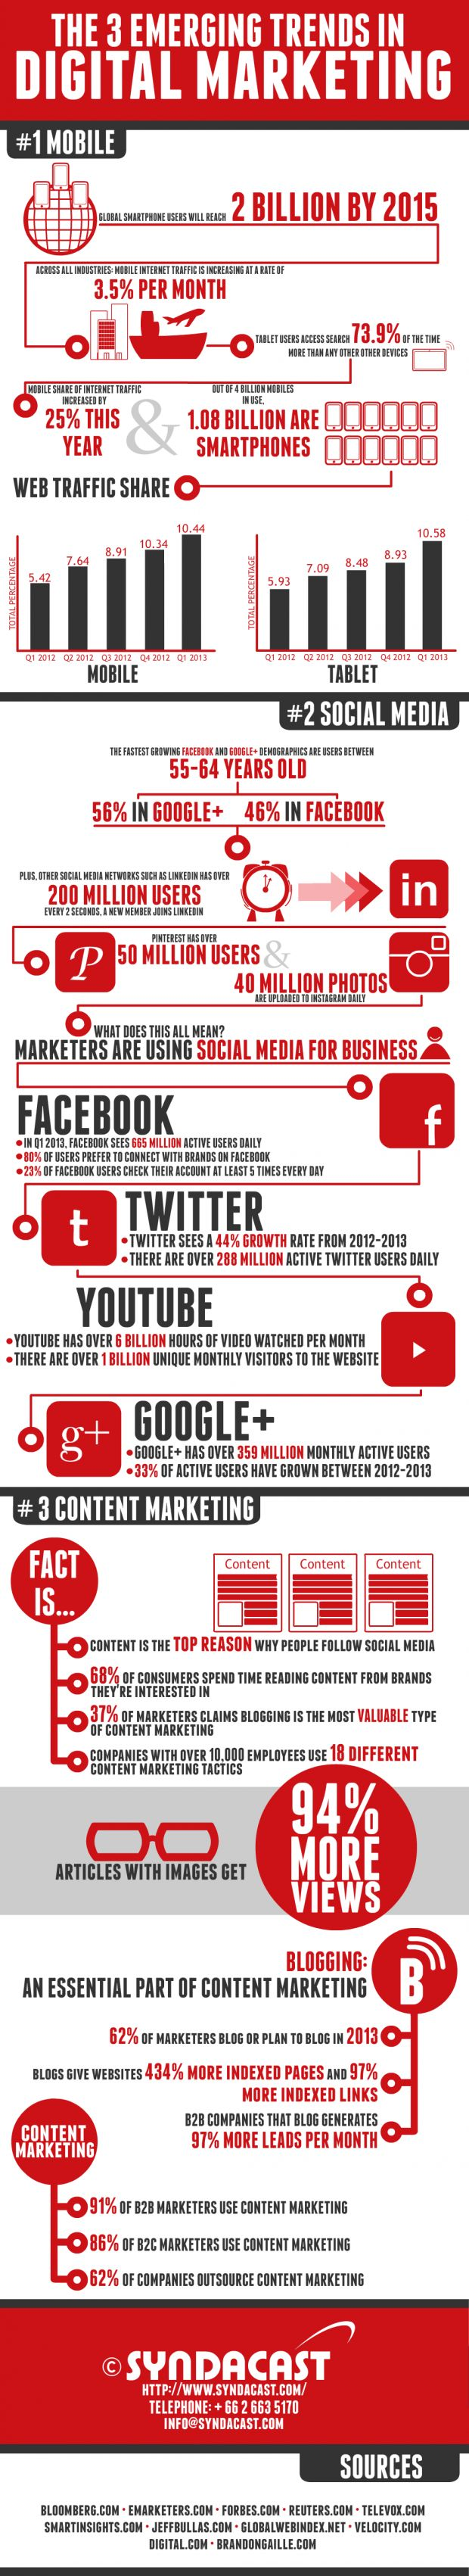 The 3 Emerging Trends In Digital Marketing #infogafia #infographic  #marketing